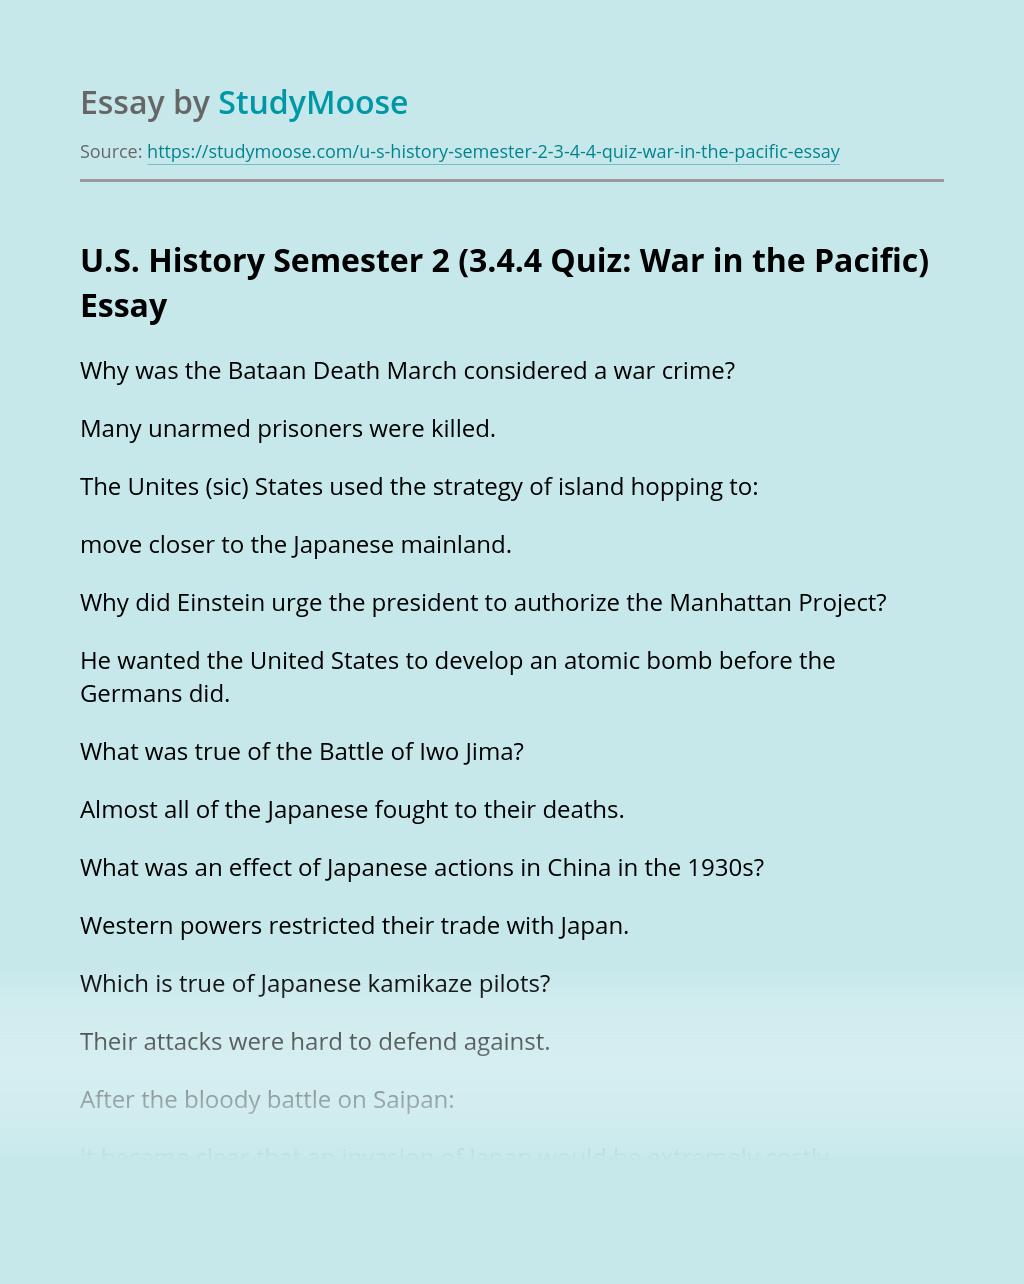 U.S. History: Semester 2(Quiz: War in the Pacific)